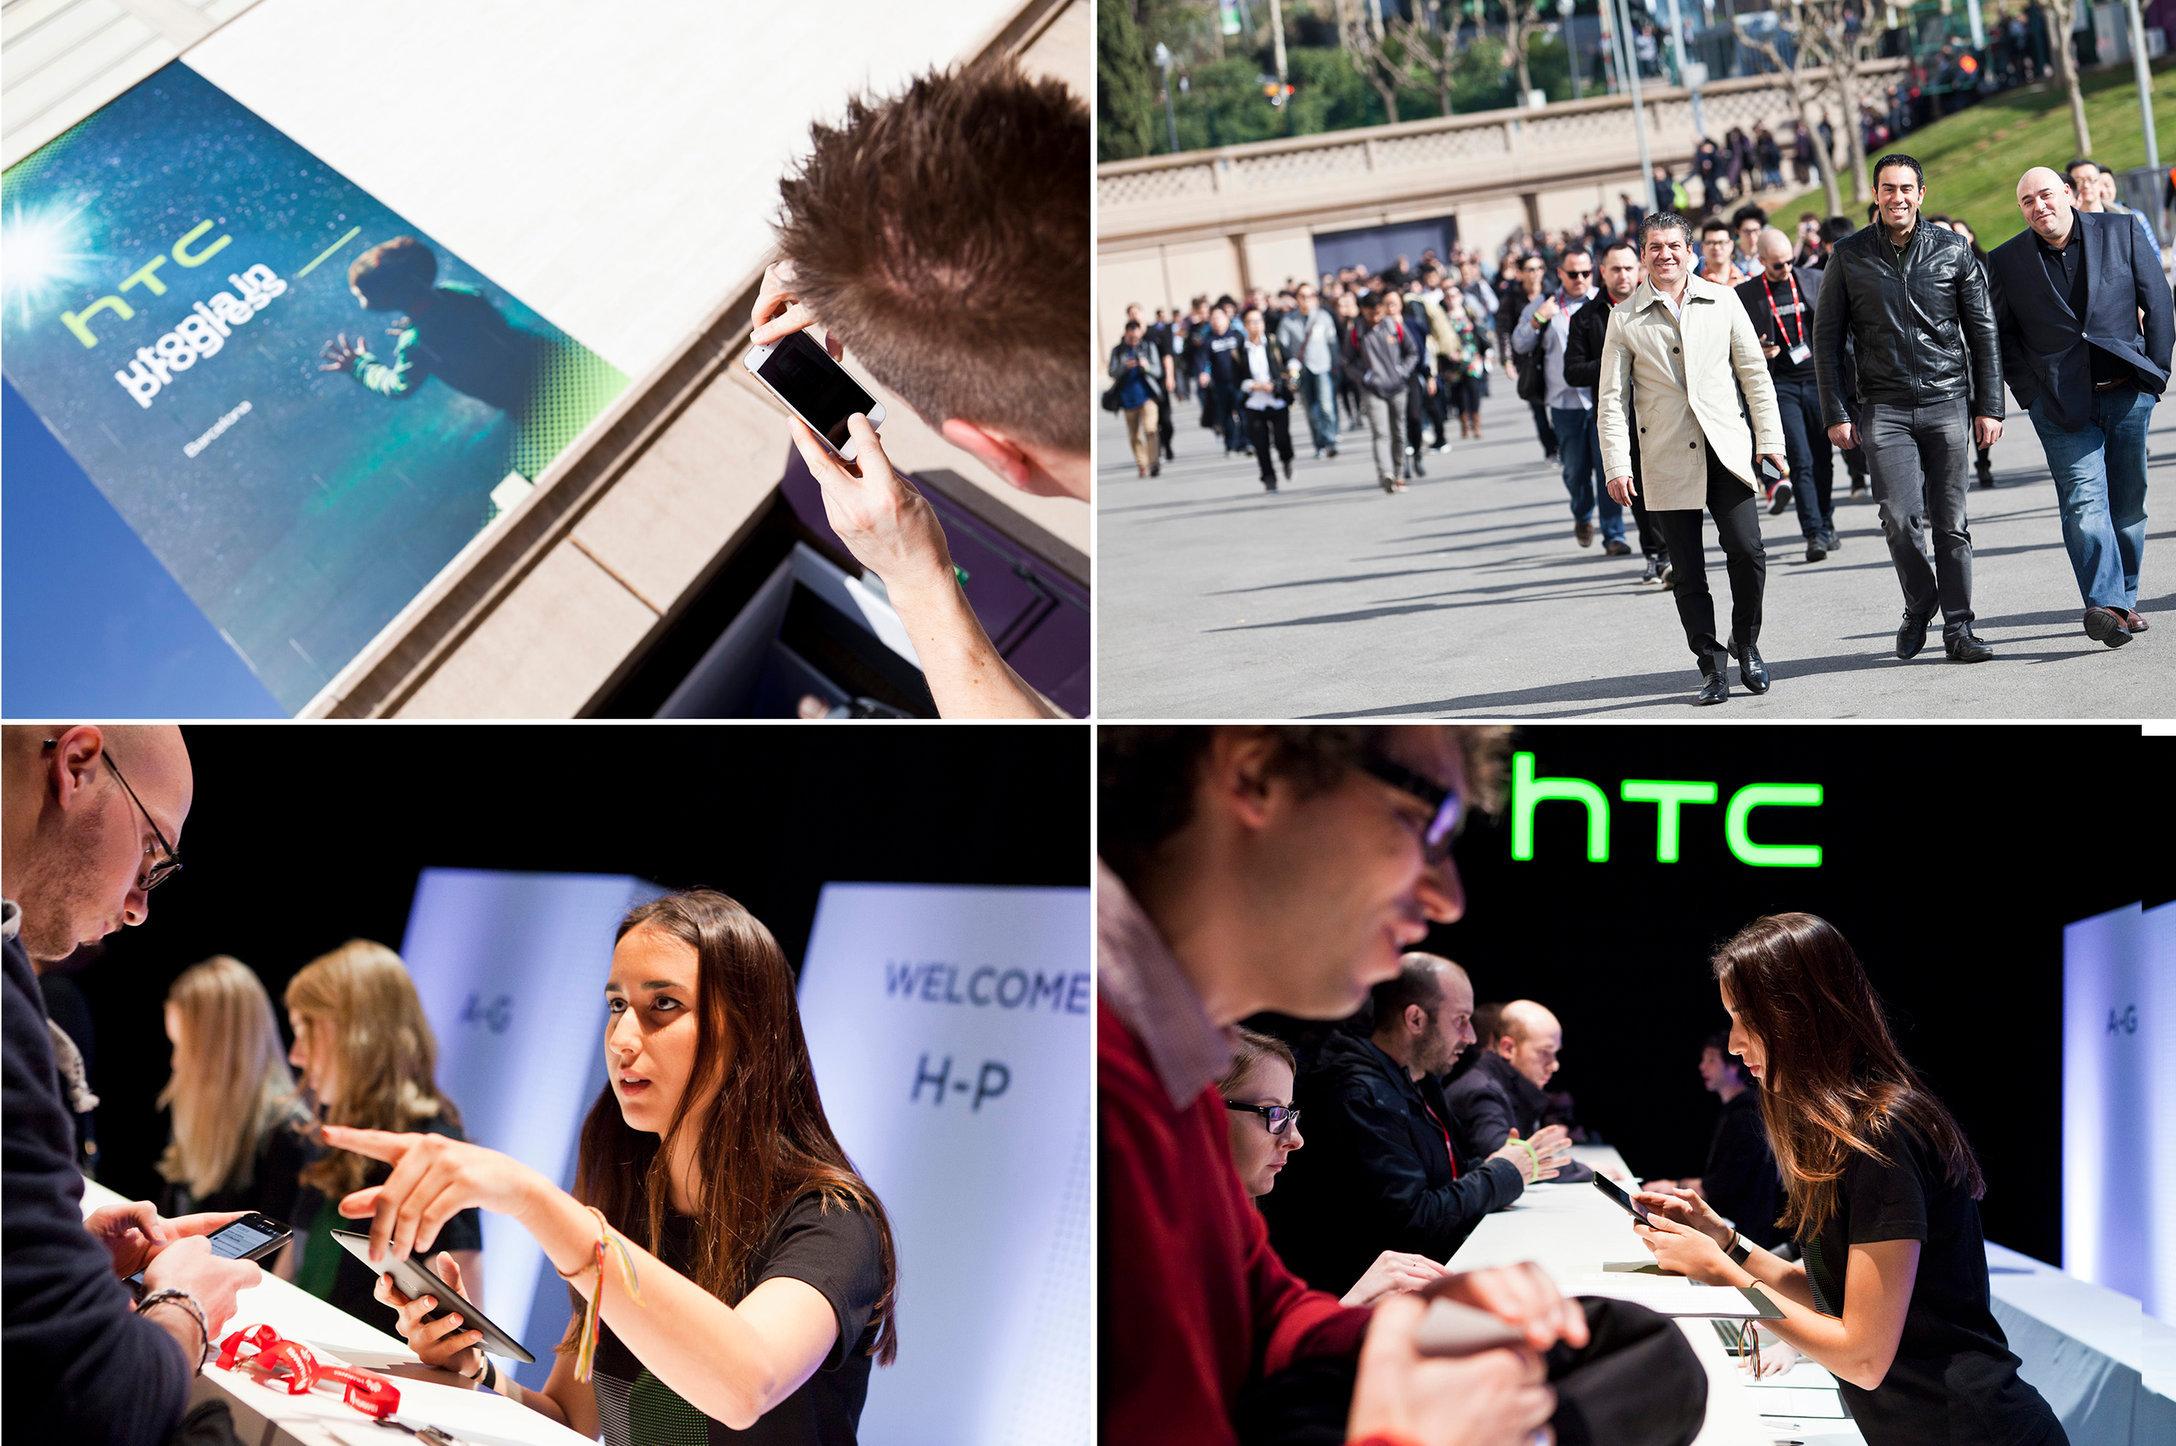 0002_HTC-Barcelona2015-2225-HighRes.jpg